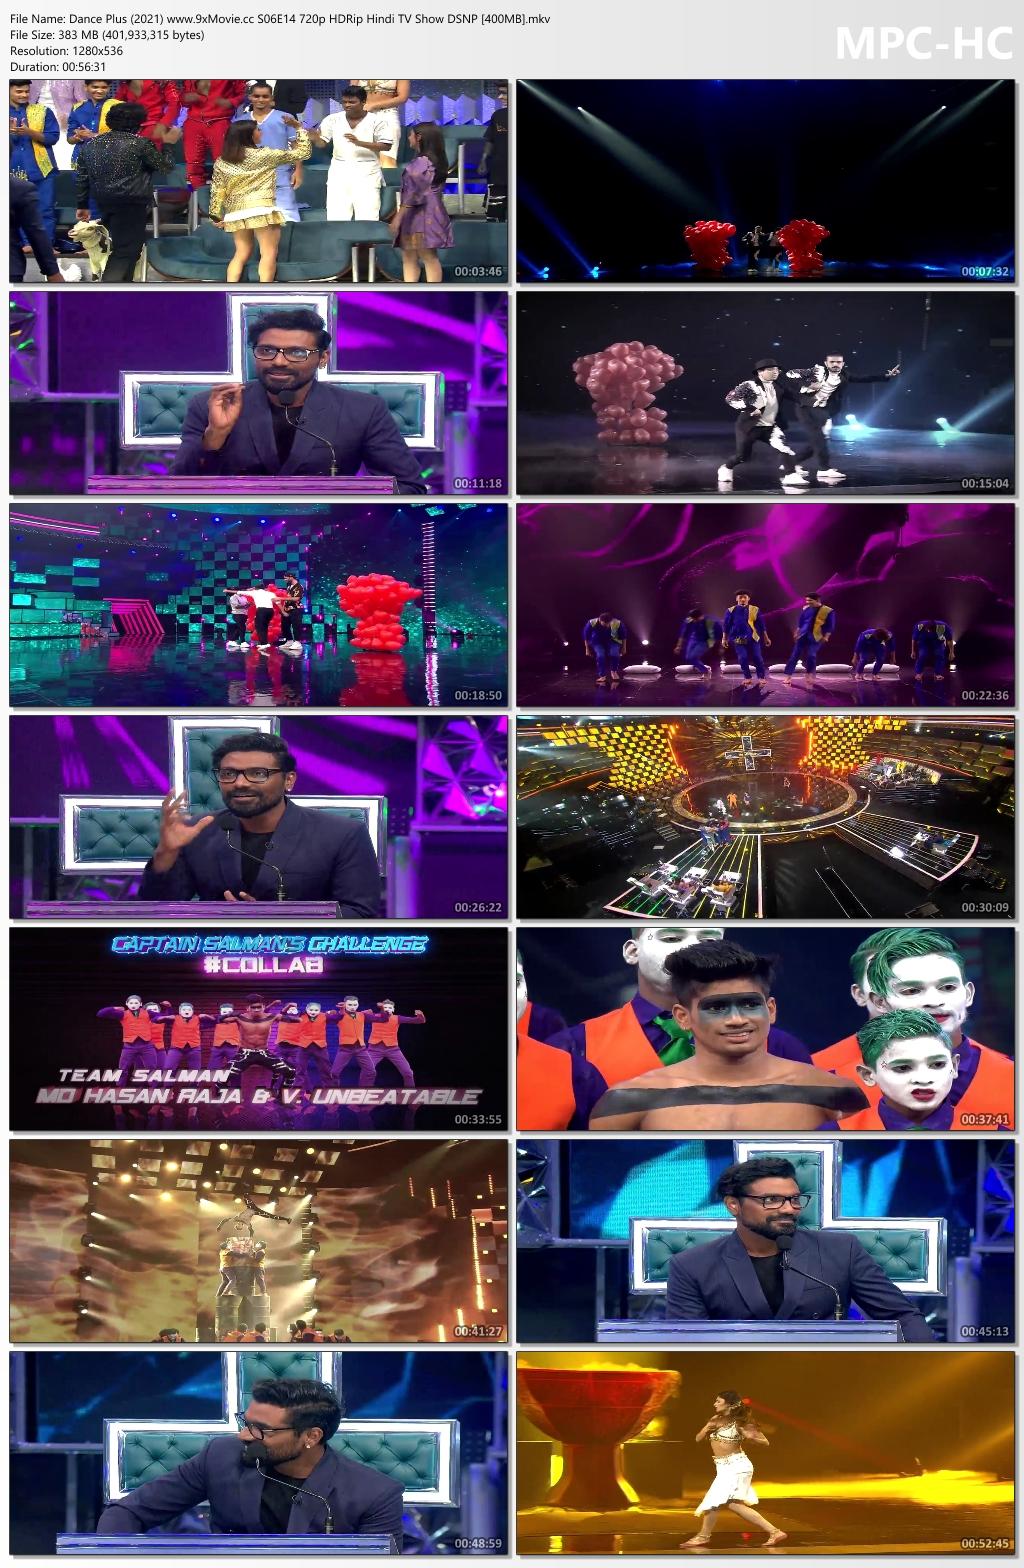 Dance-Plus-2021-www-9x-Movie-cc-S06-E14-720p-HDRip-Hindi-TV-Show-DSNP-400-MB-mkv